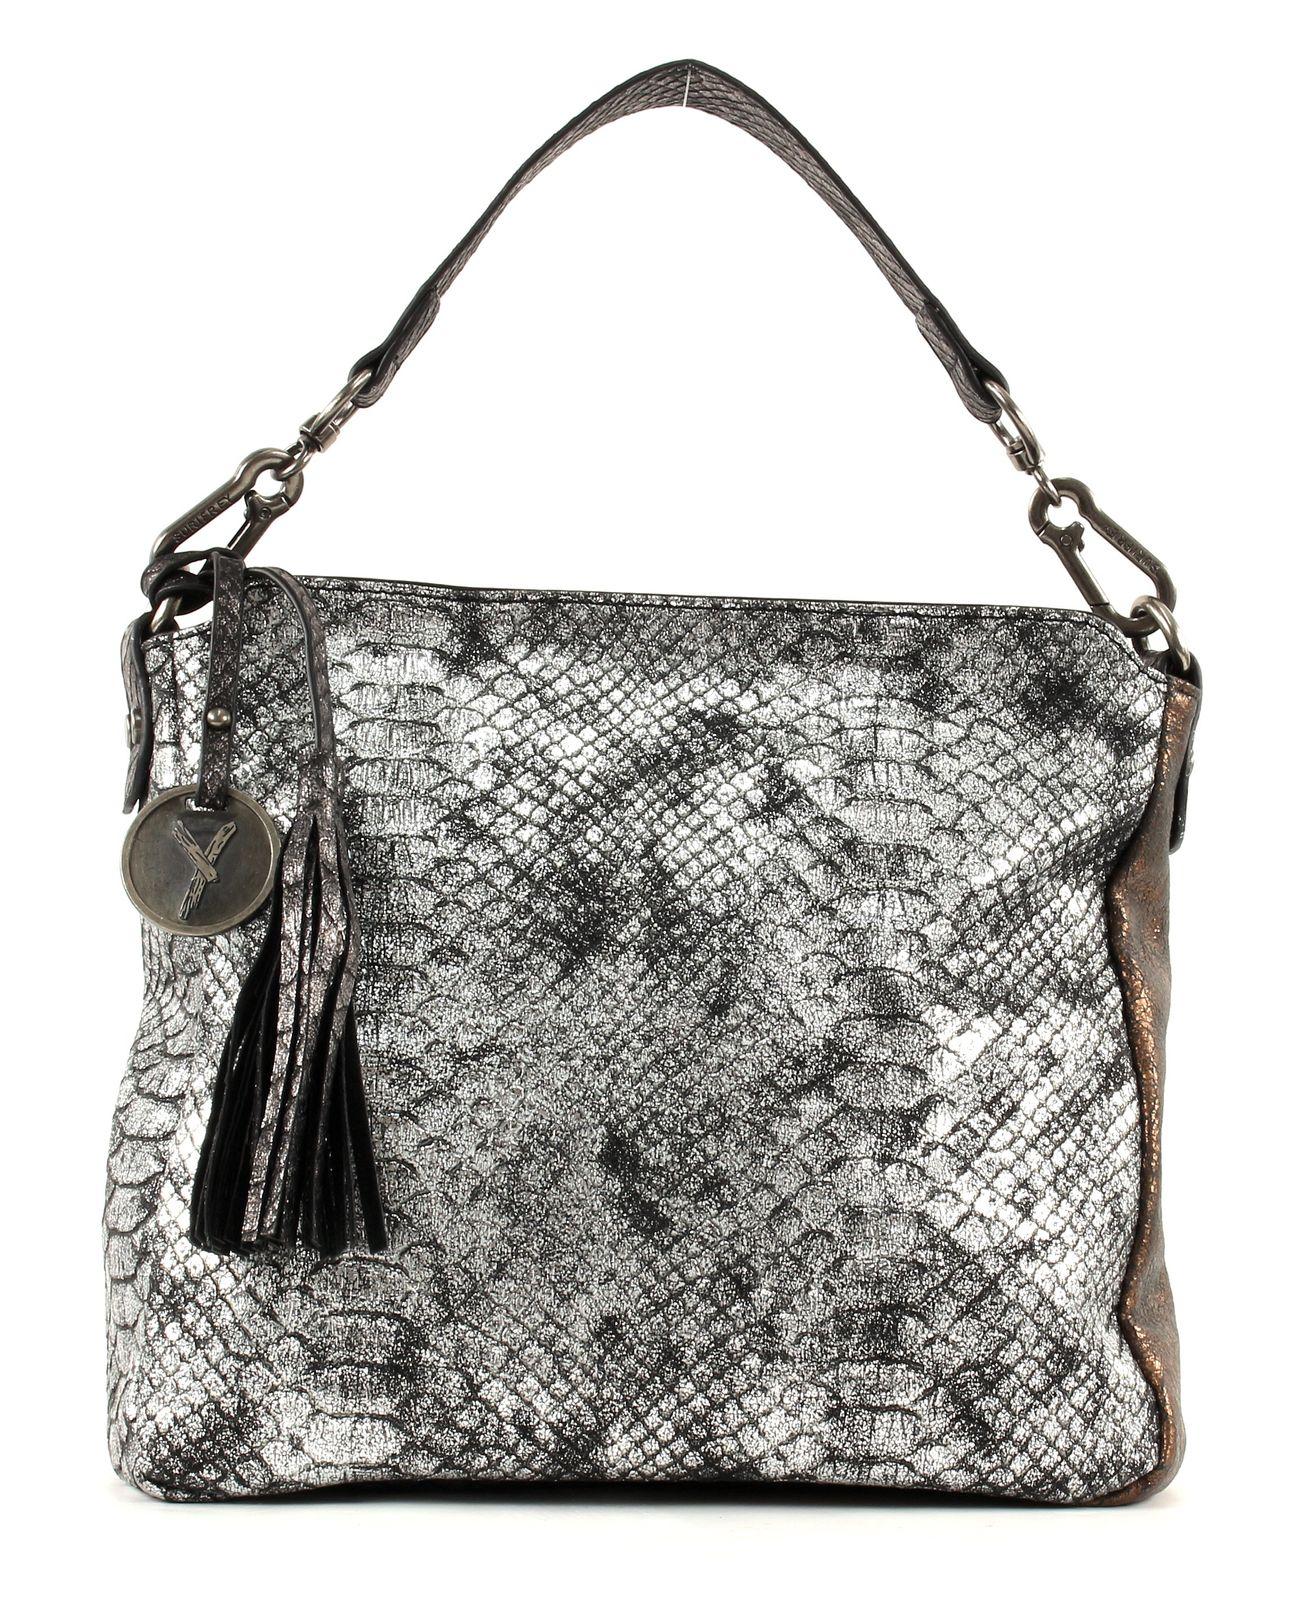 suri frey fanny top zip bag handtasche umh ngetasche. Black Bedroom Furniture Sets. Home Design Ideas